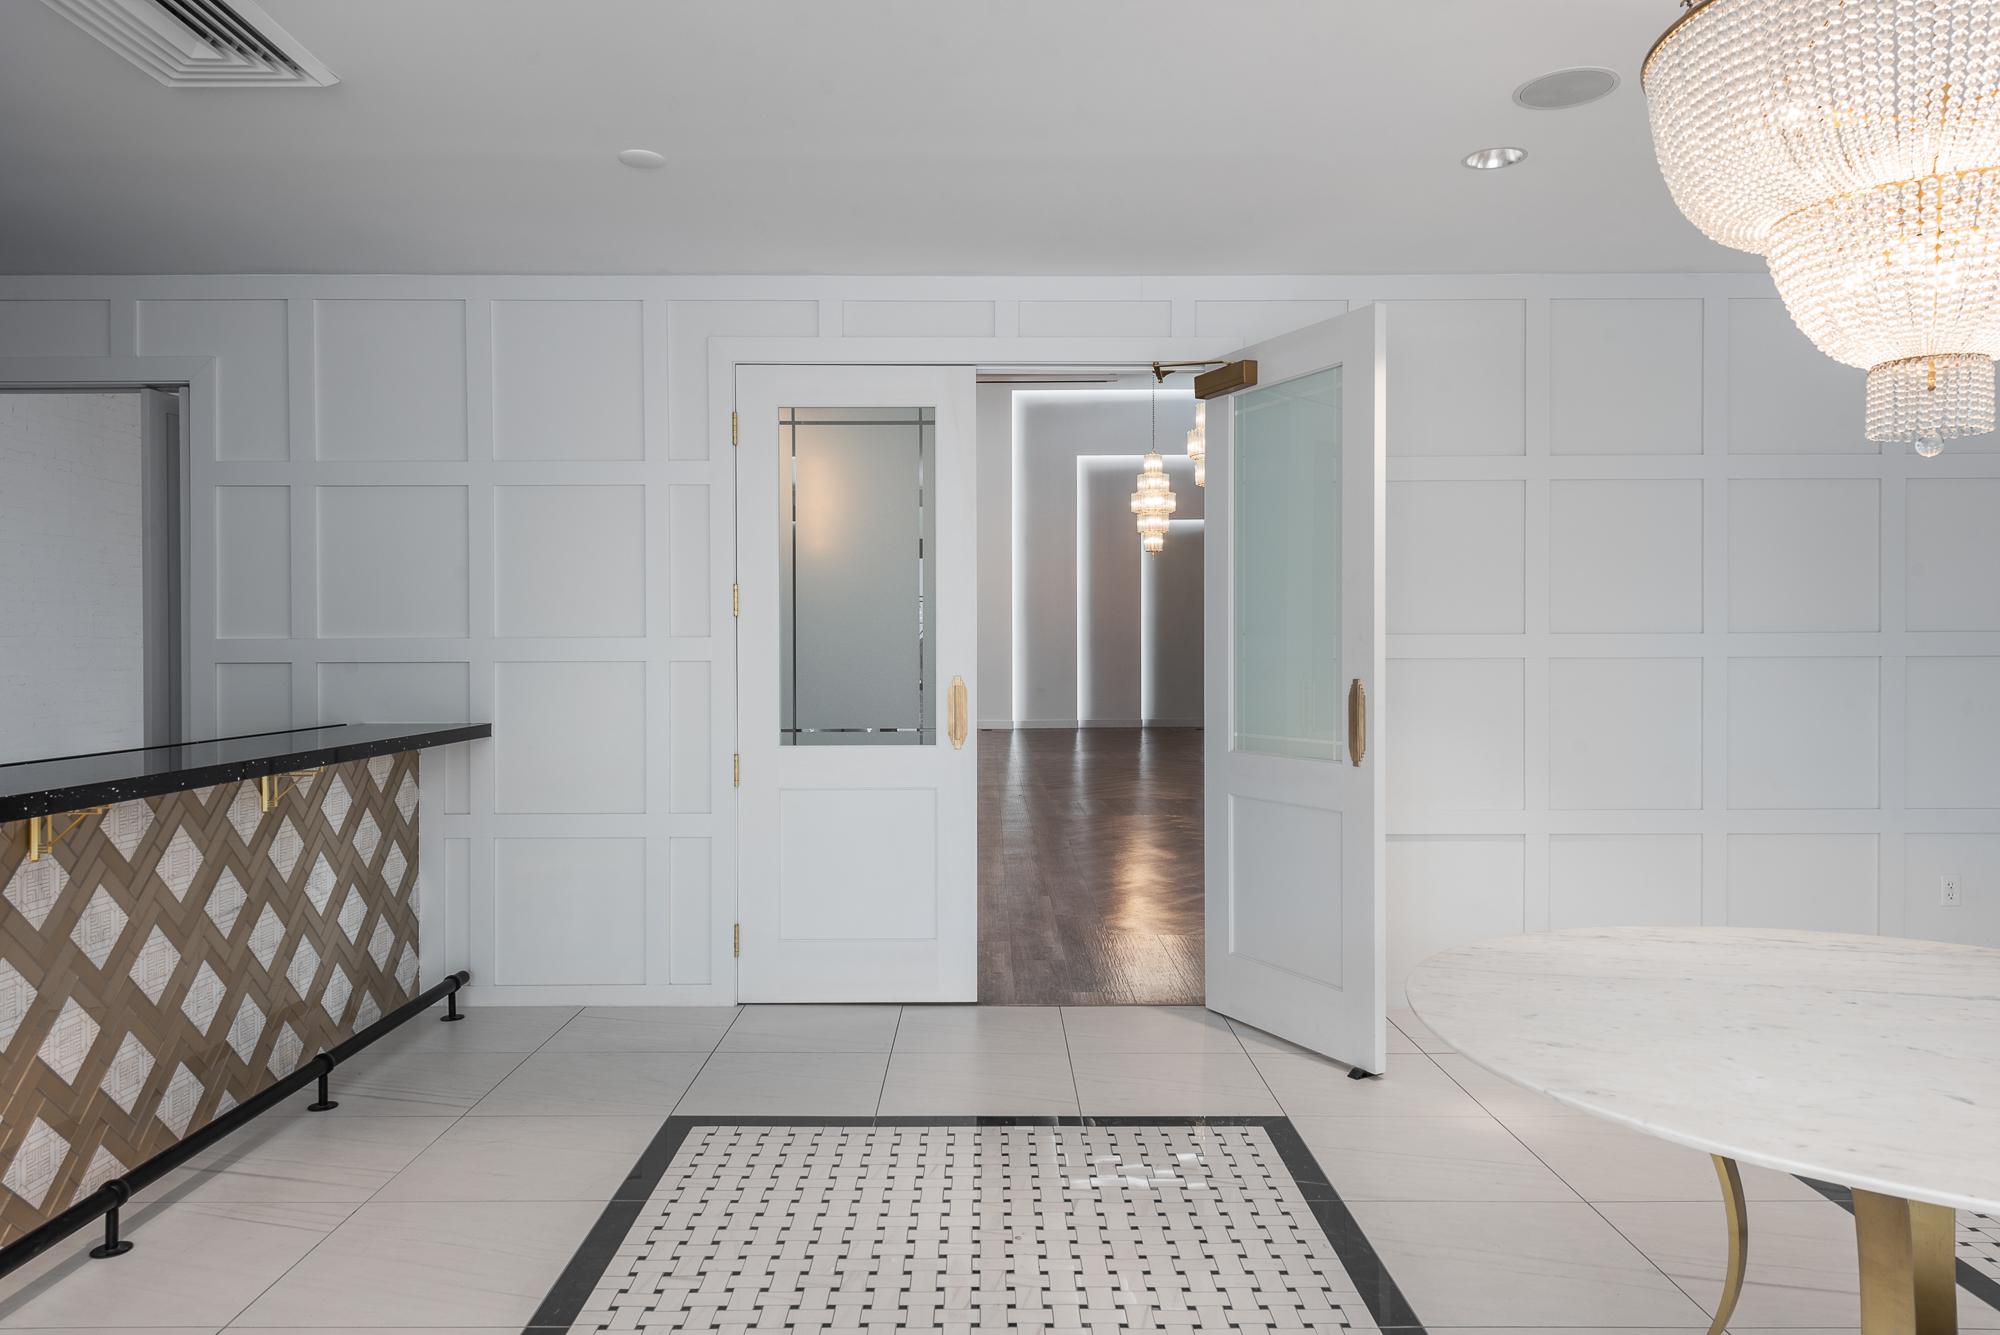 Micamy Design Studio_Interior Design_Clay Theatre_Event Space_Venue_Wedding_Art Deco_Modern_Marble Floors_Tile_Flower_Cocktail Bar_Chandelier.jpg